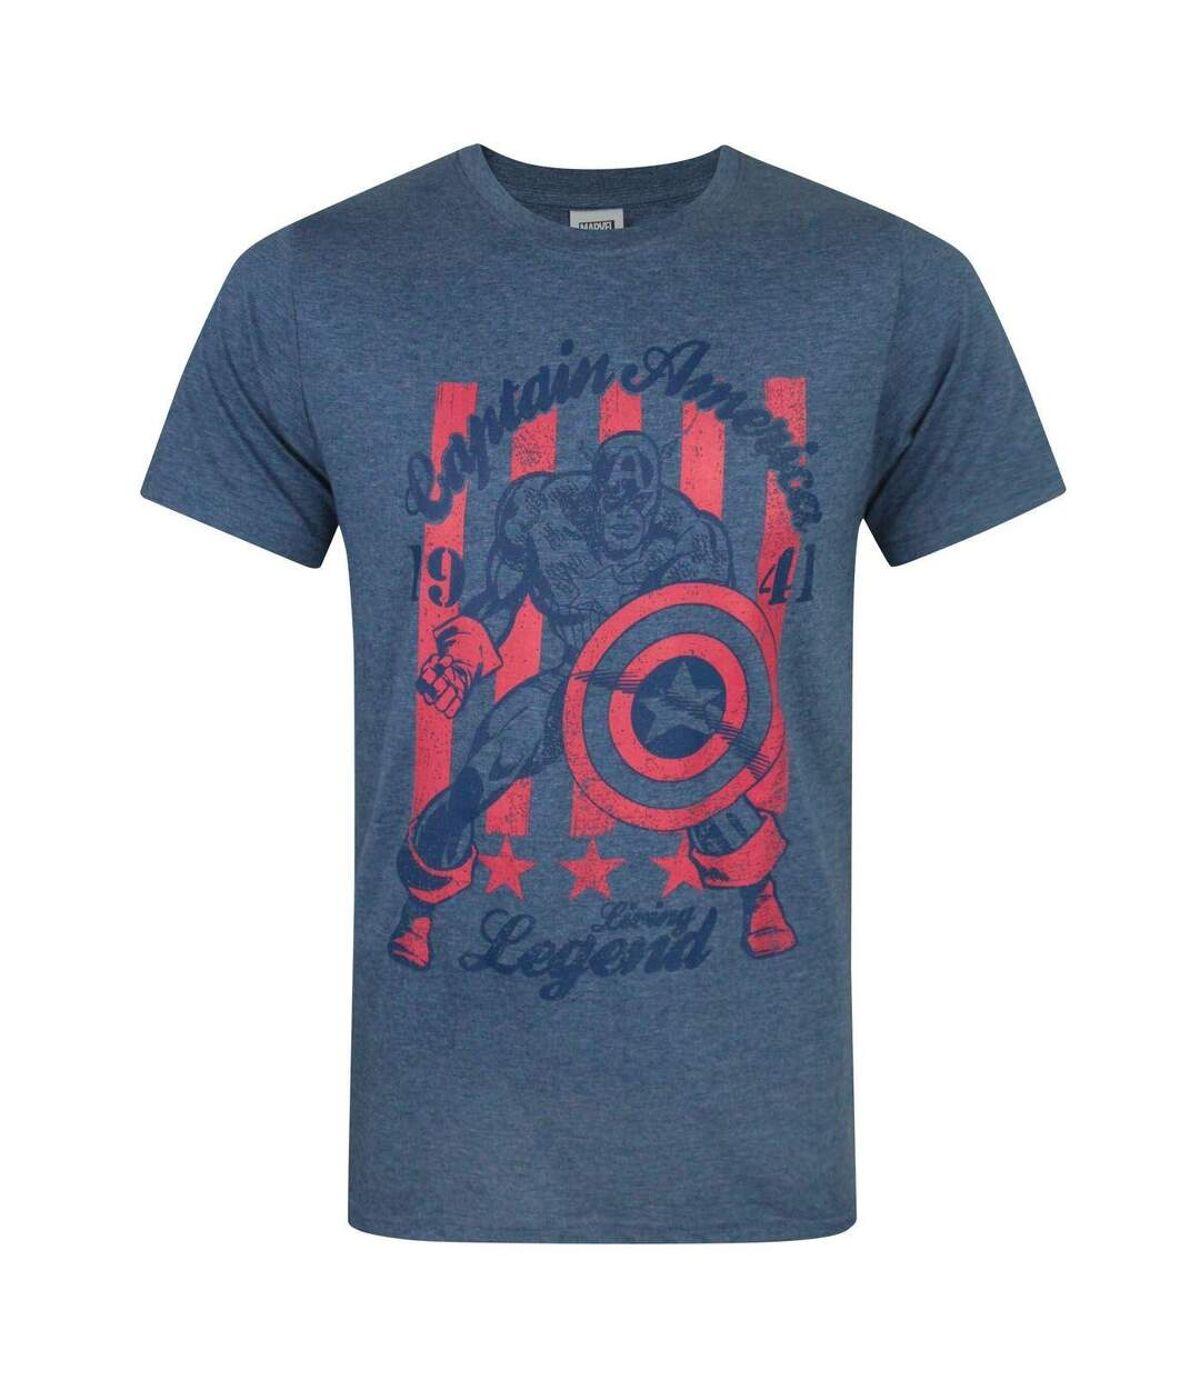 Captain America Official Mens Living Legend T-Shirt (Blue) - UTNS5043